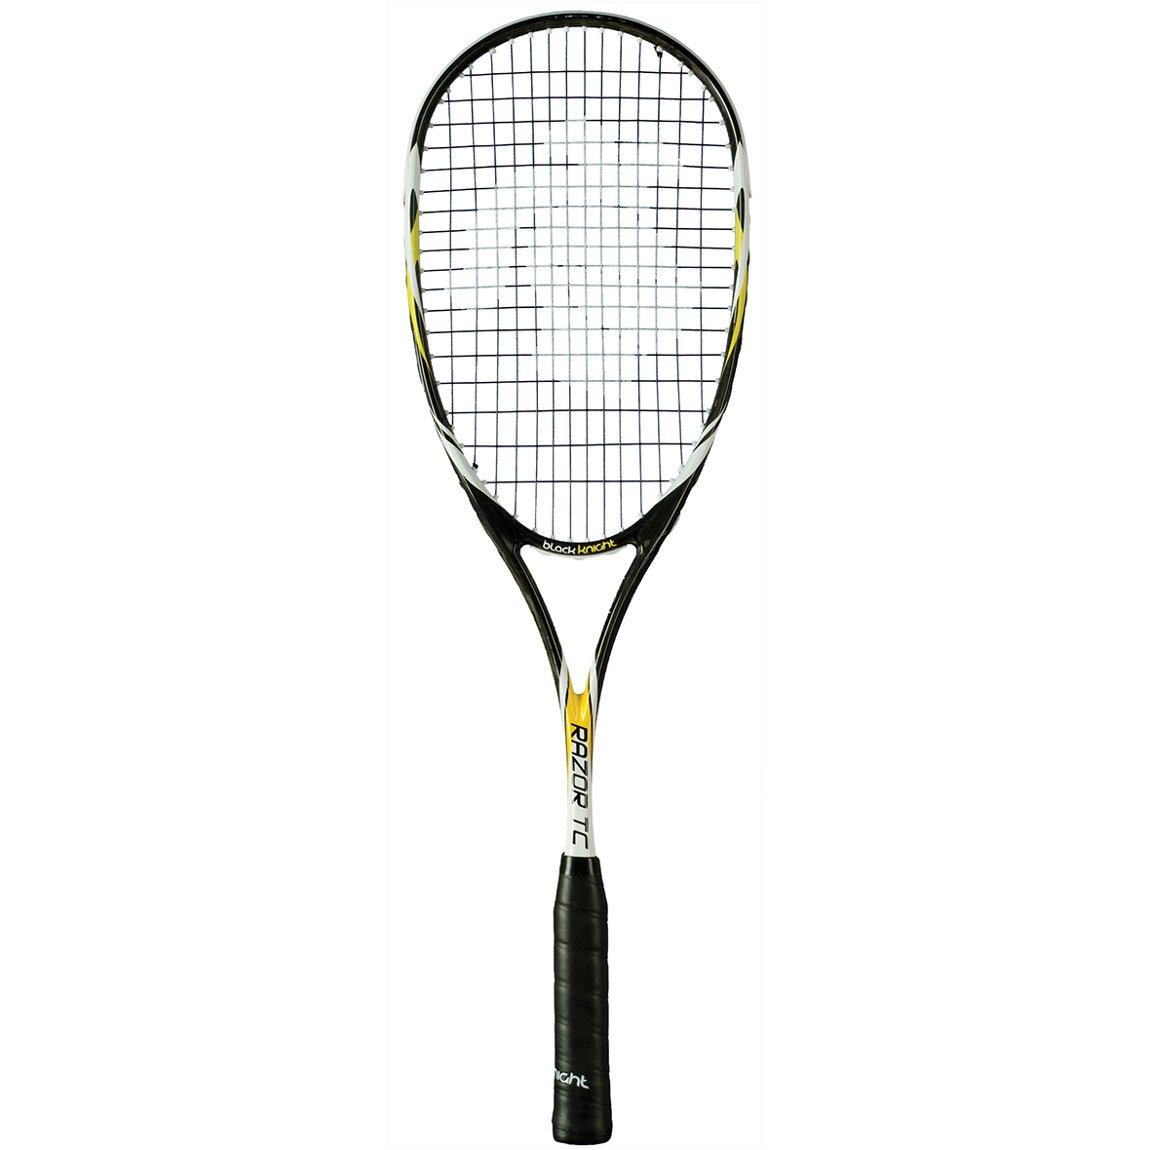 Black Knight Reflex Squash Racket